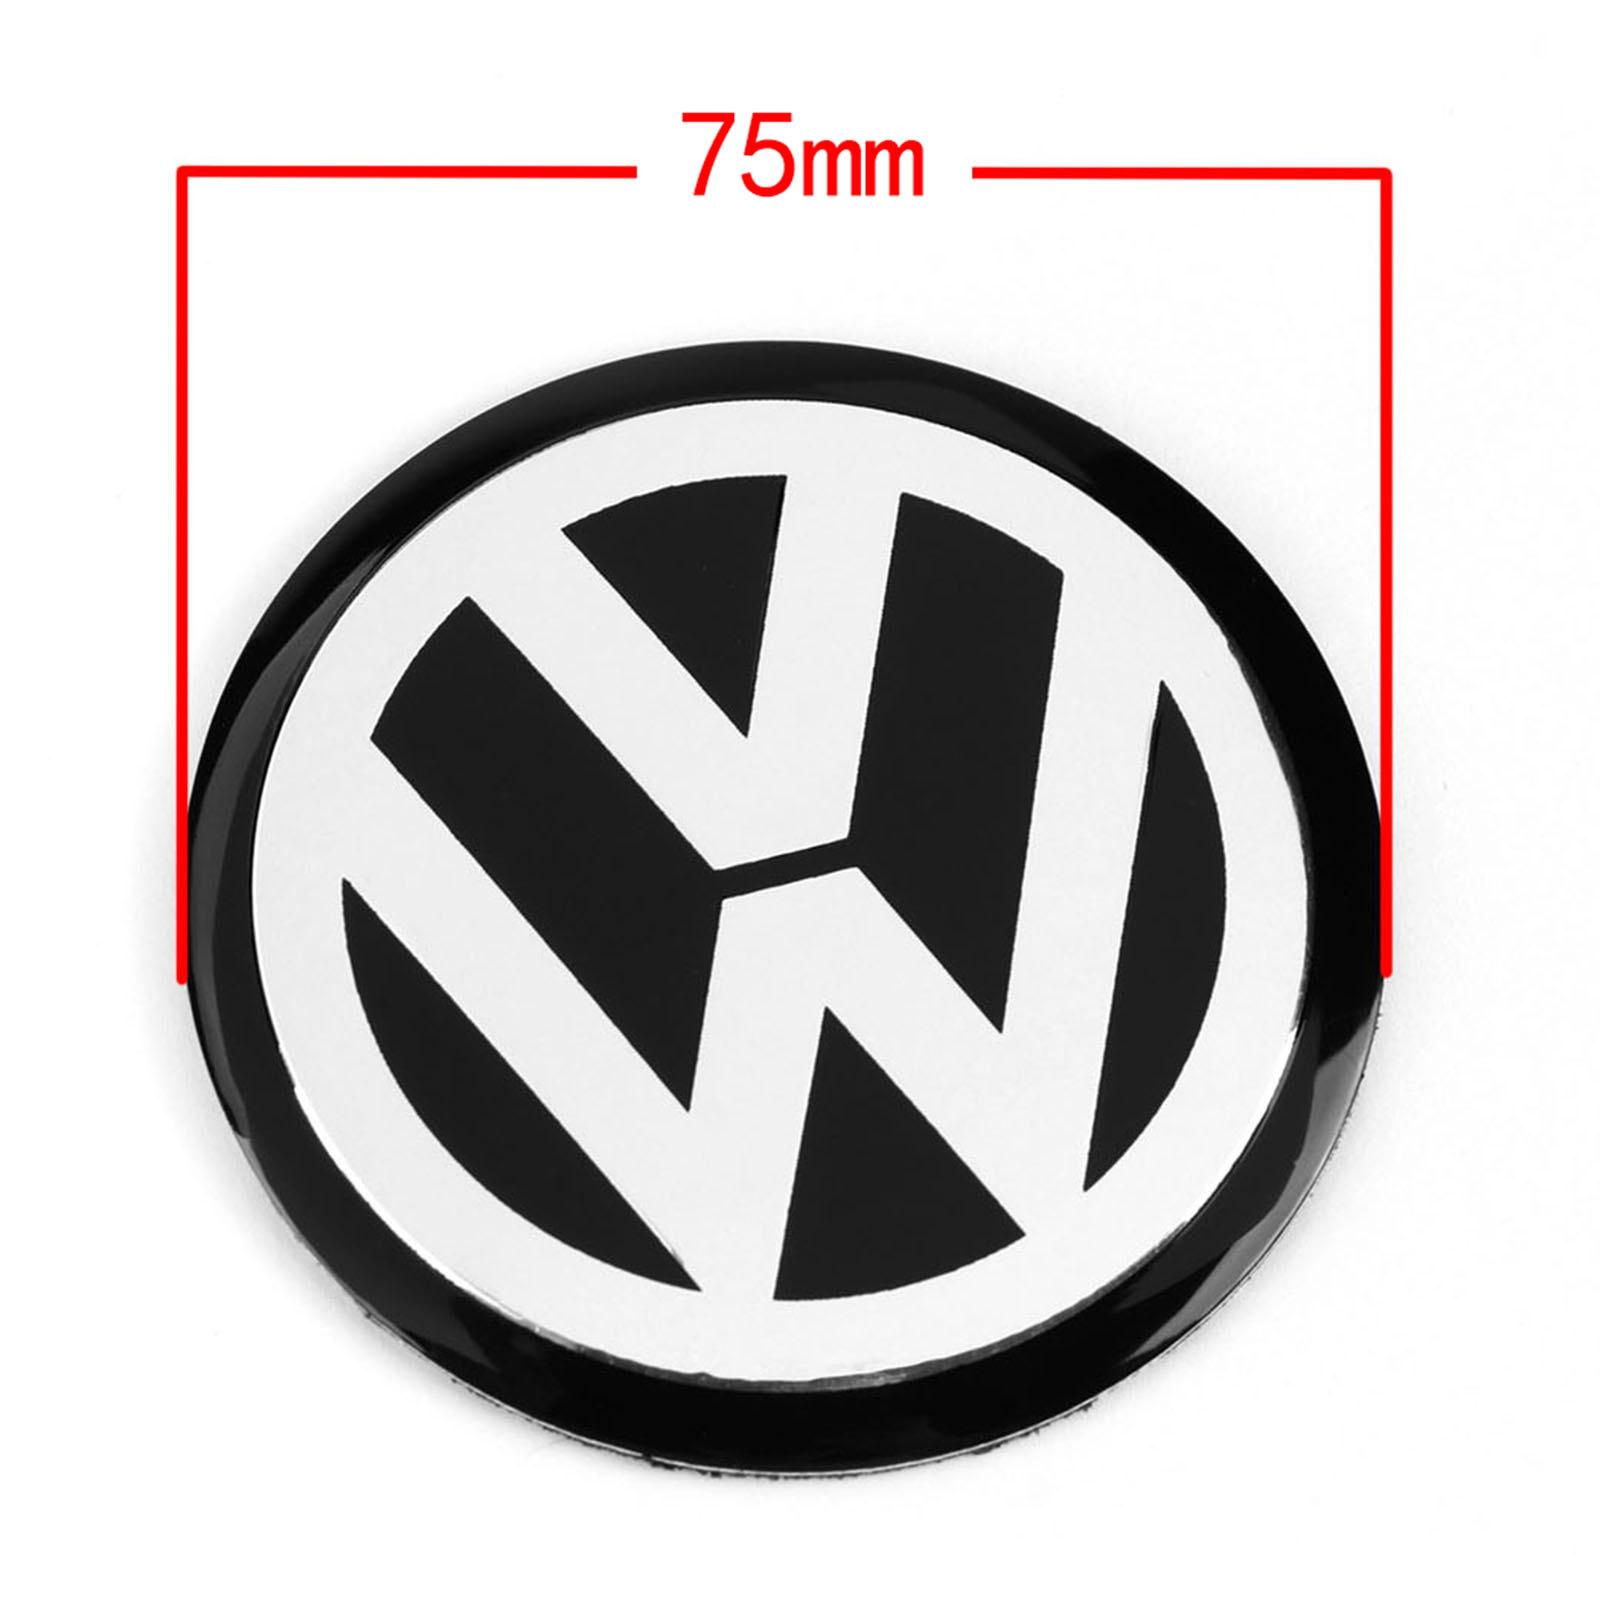 4pcs 75MM Black Car Wheel Center Hub Cap Badge Emblem Decal Wheel Sticker Styling For VW